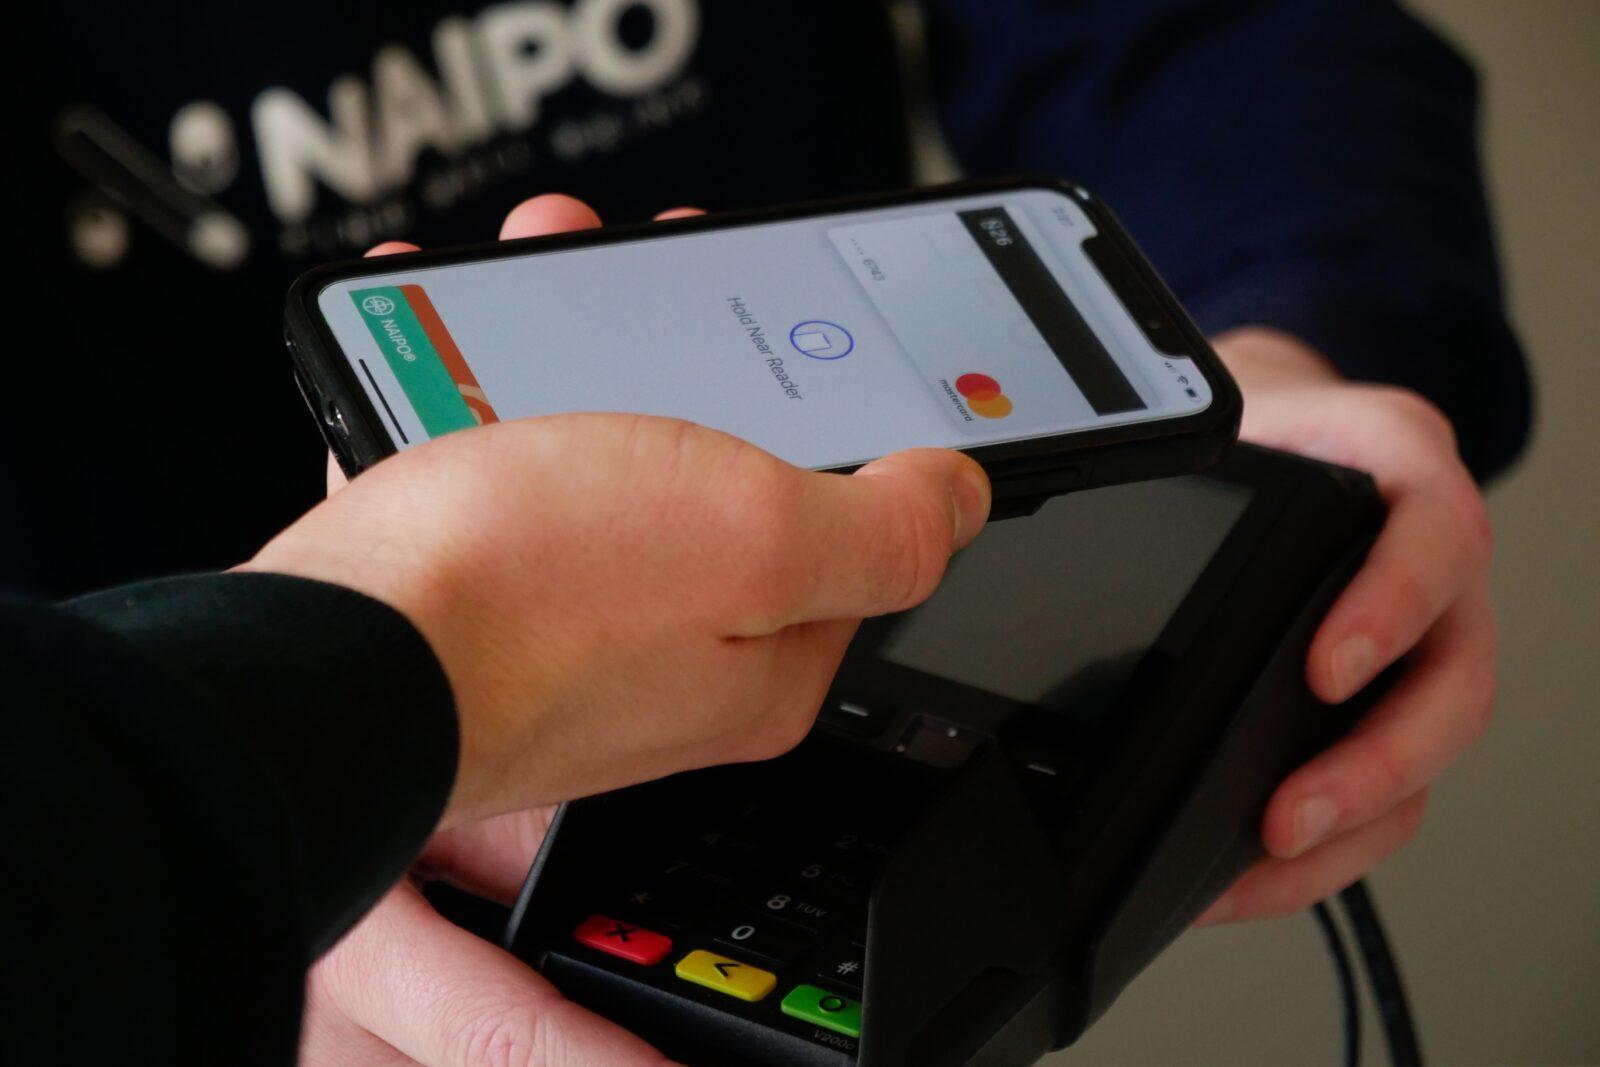 Aplicativos de pagamento